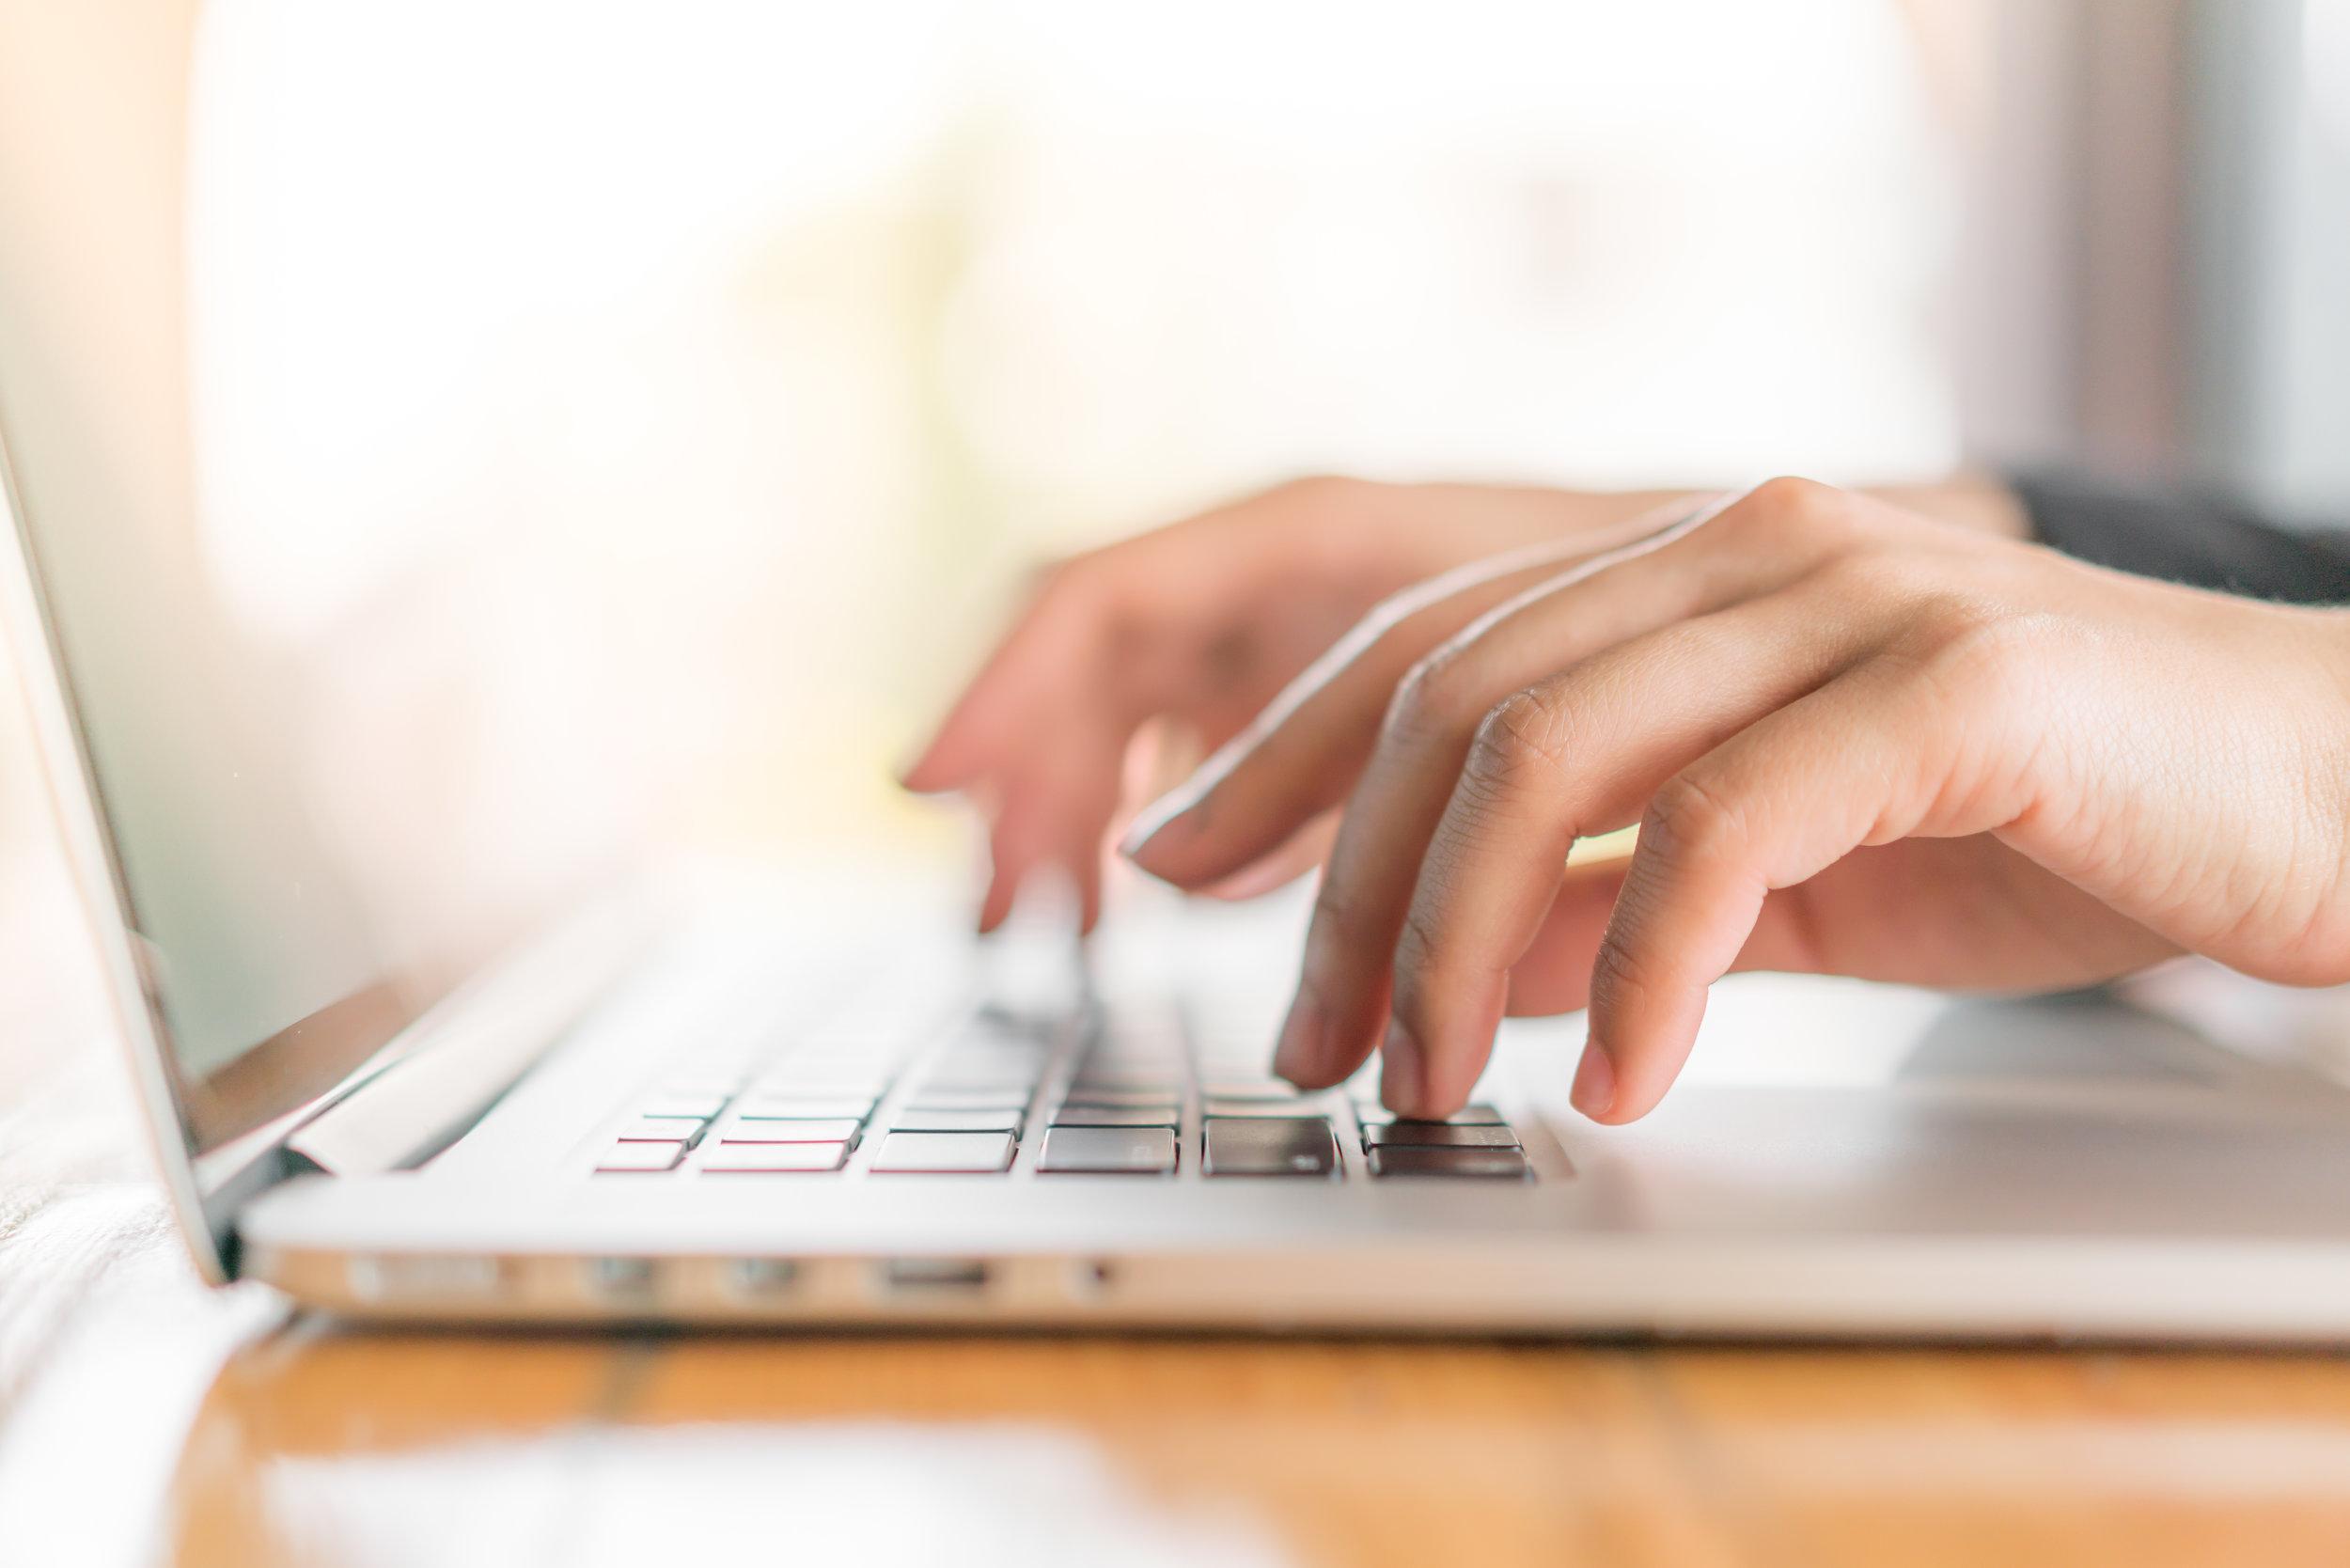 Laptop Hands Pic.jpg